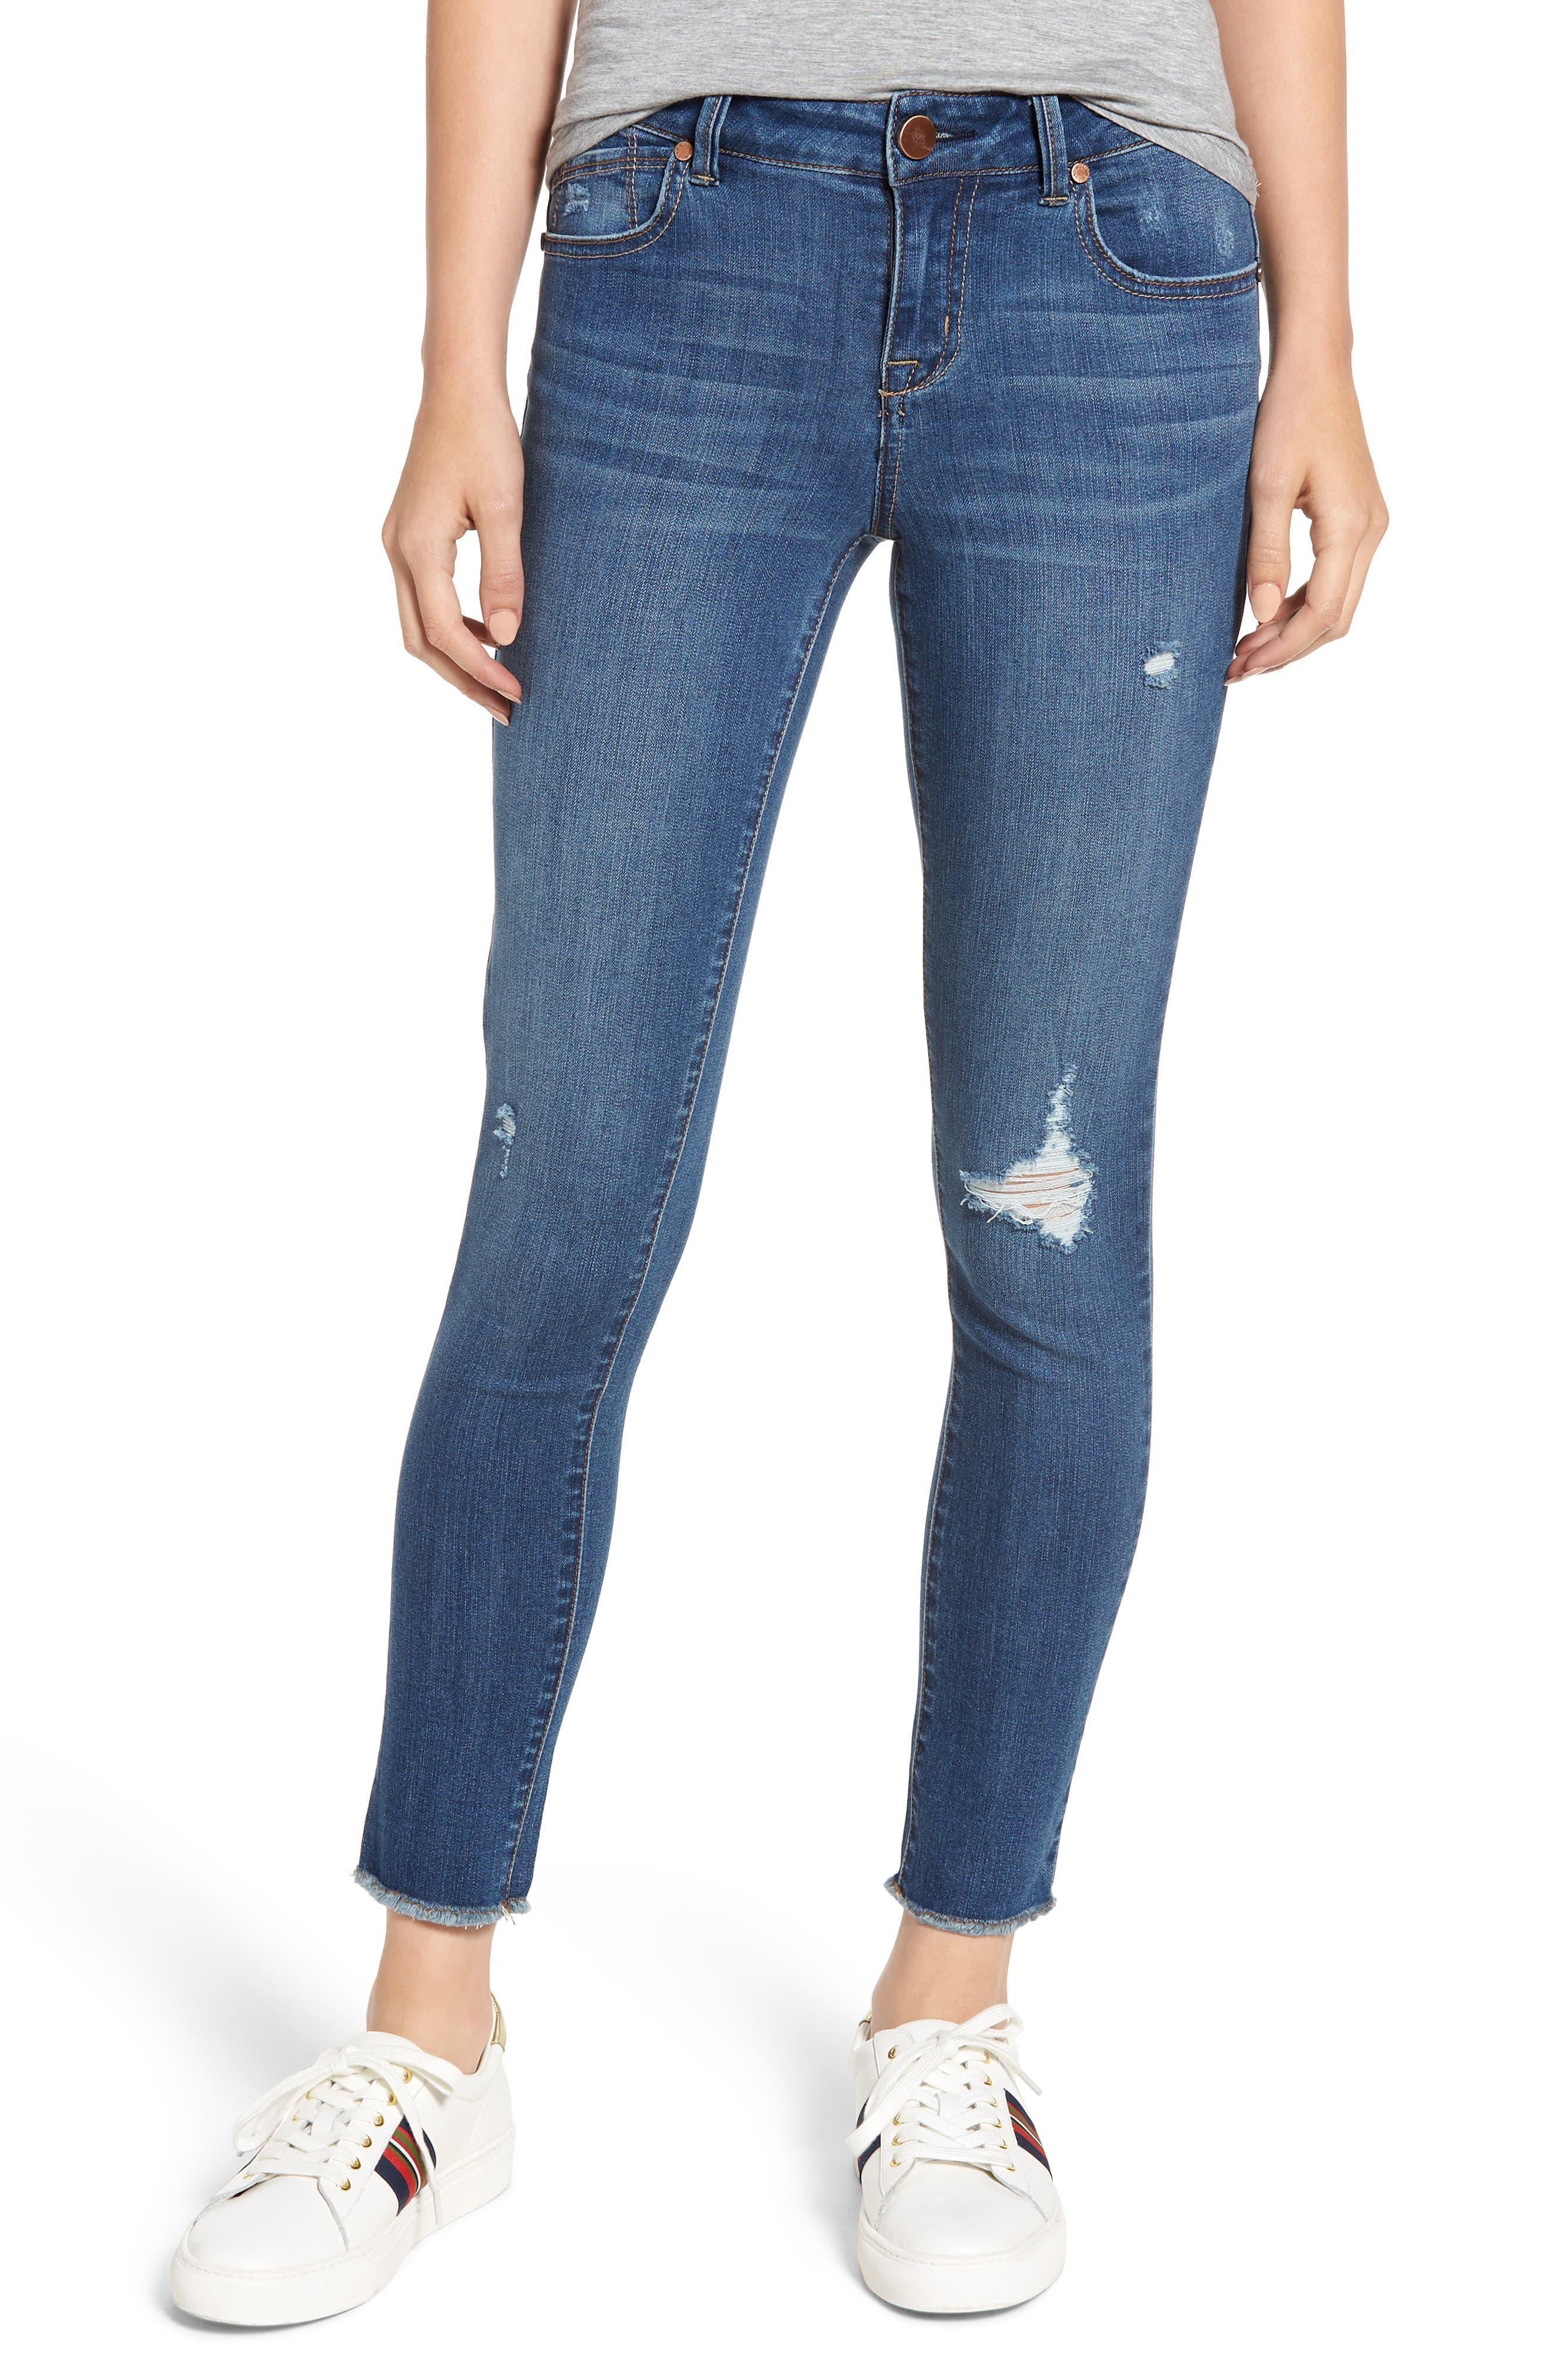 1822 DENIM,                             Distressed Skinny Jeans,                             Main thumbnail 1, color,                             CHRISTINA